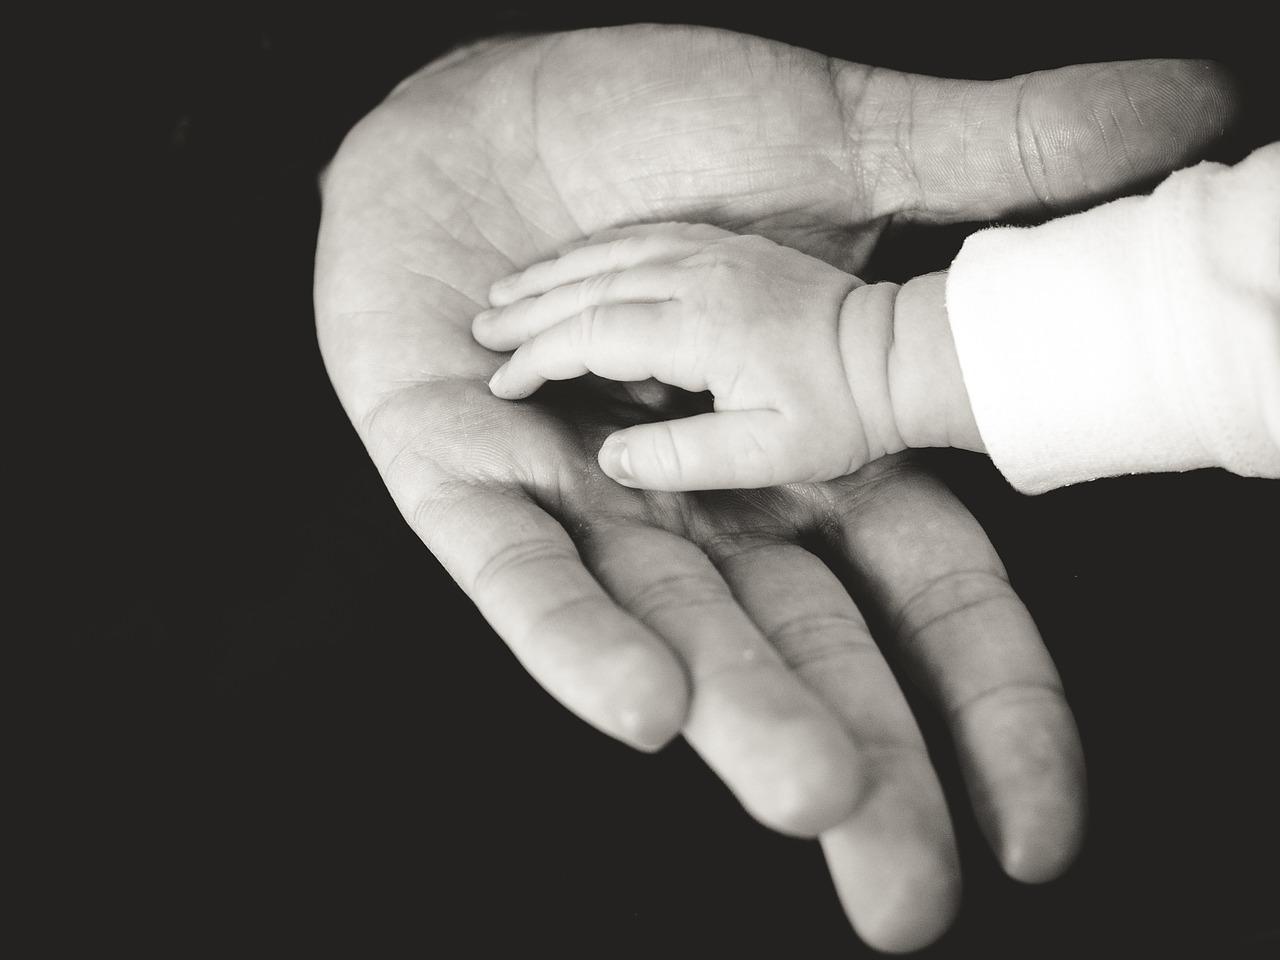 hands, baby, child